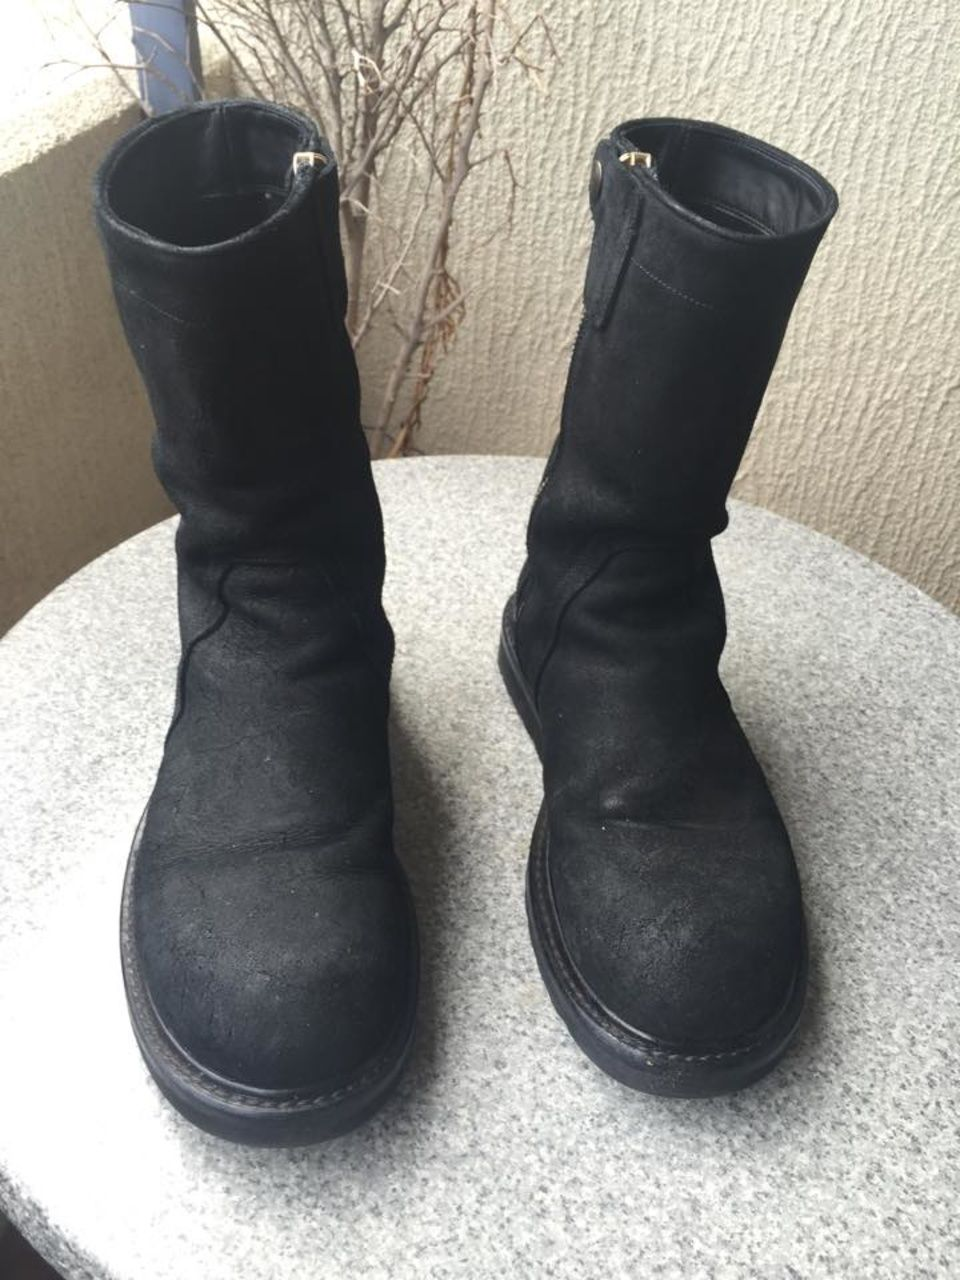 5d59c5c34c1 Rick Owens Creeper Boots Size 9  700 - Grailed